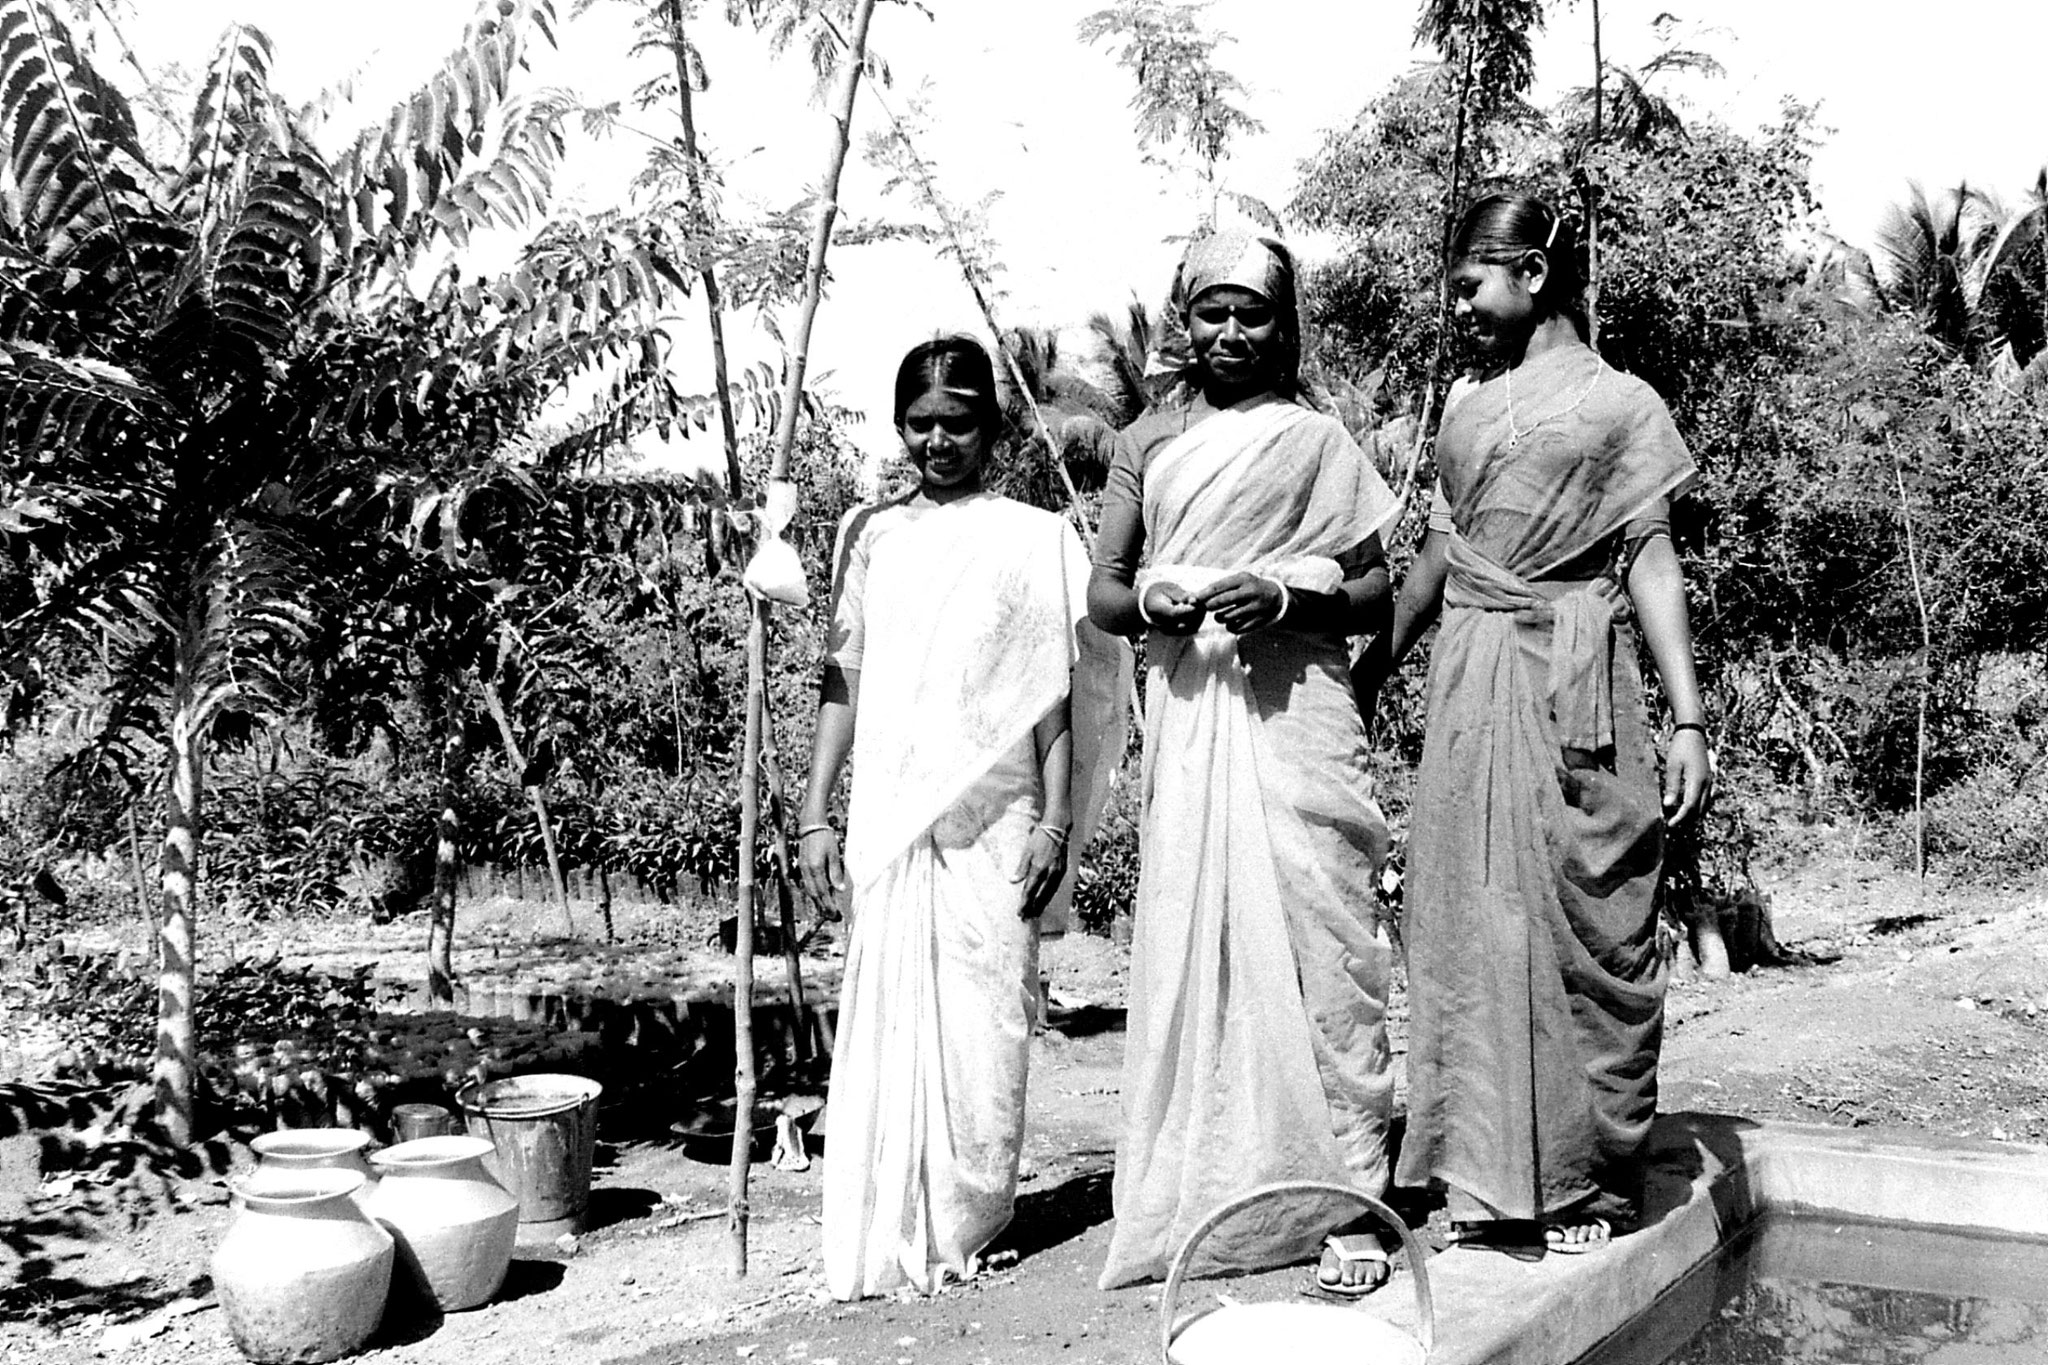 21/2/1990: 20: Batlagundi afforestation project